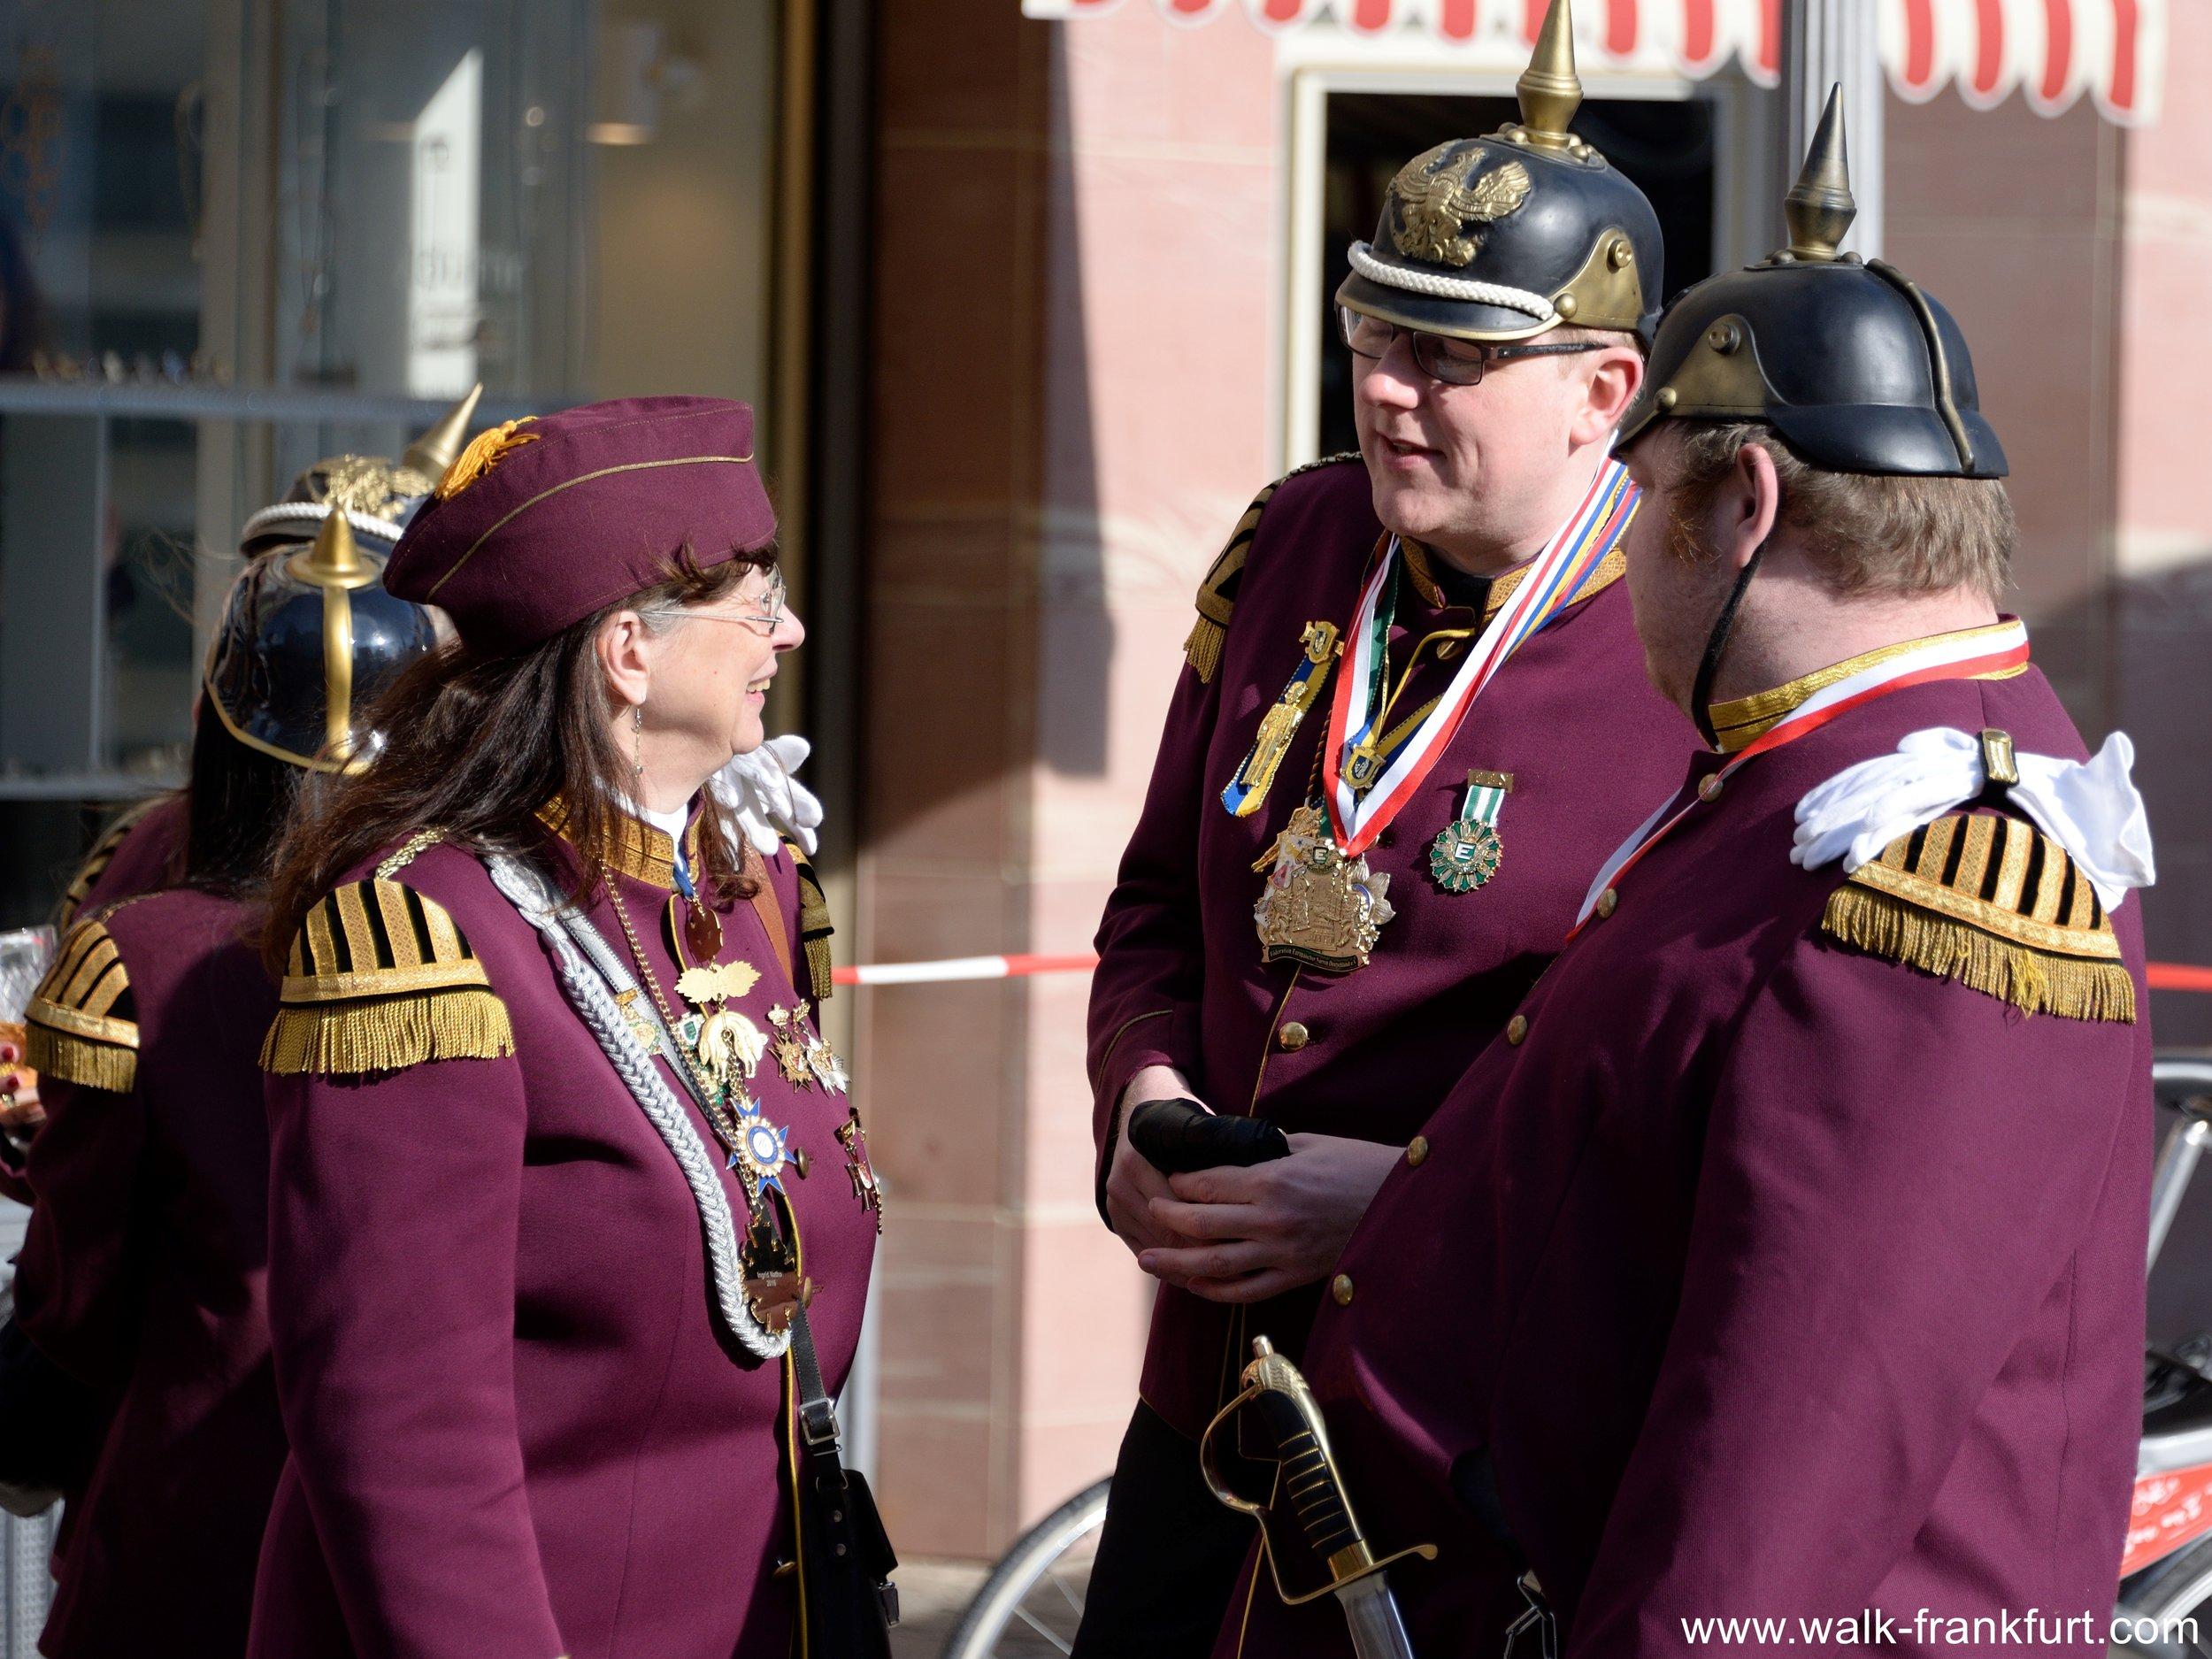 Prussian hats